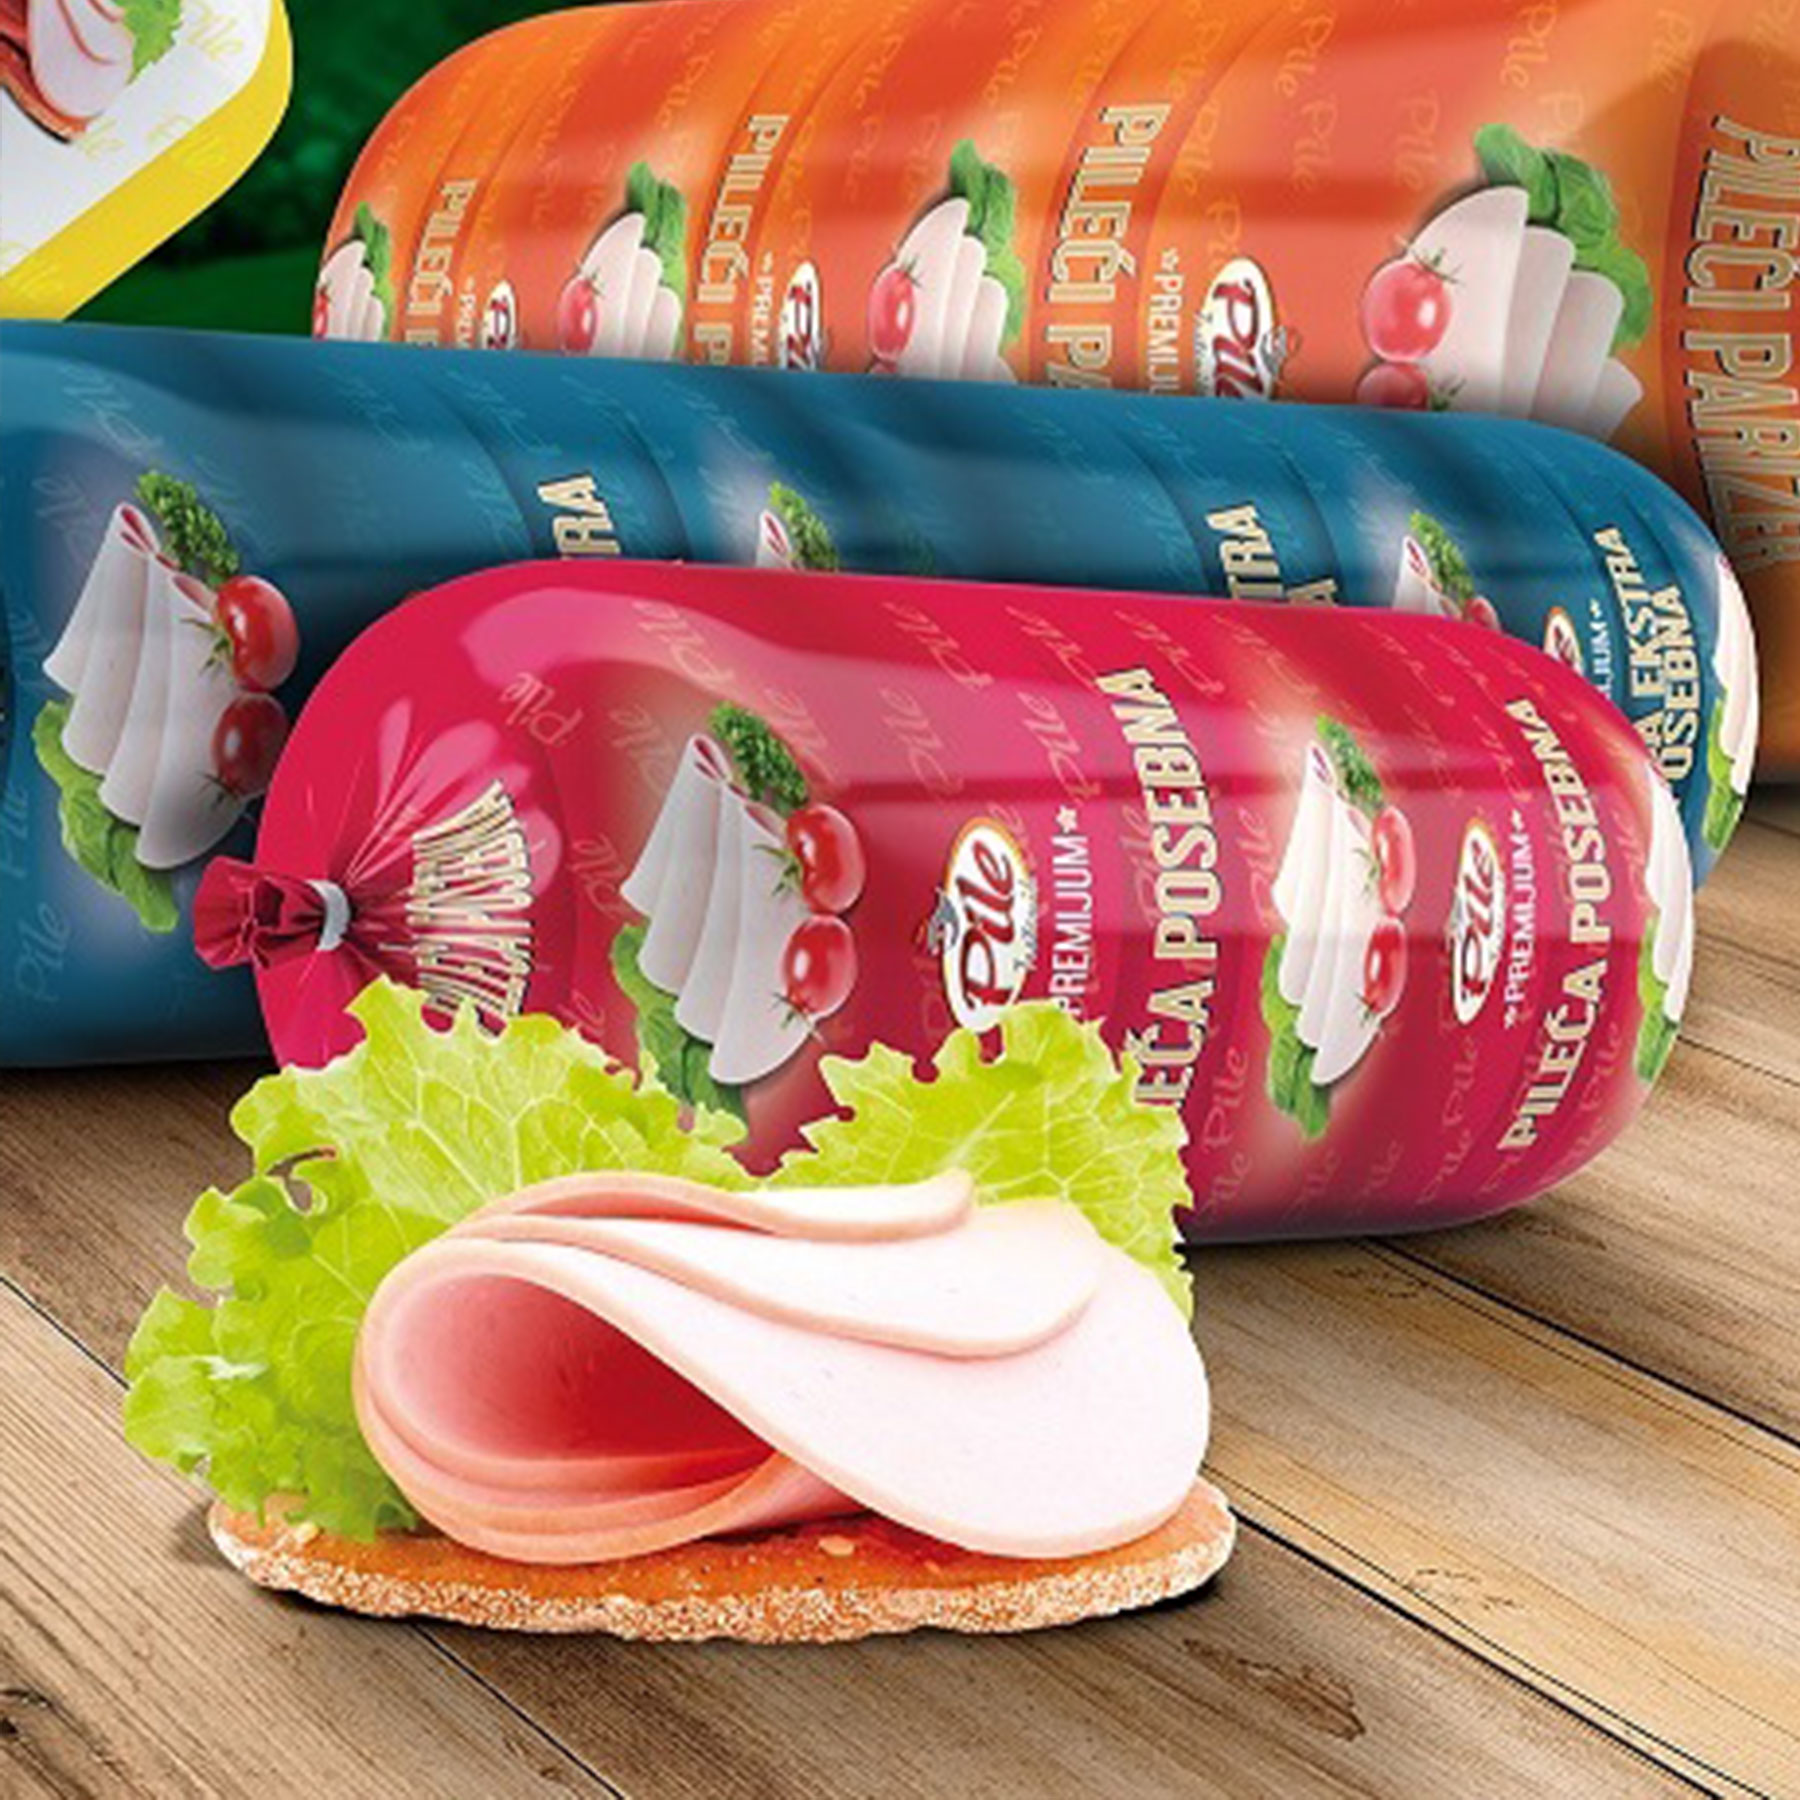 Pileće salame - Pile Trstenik